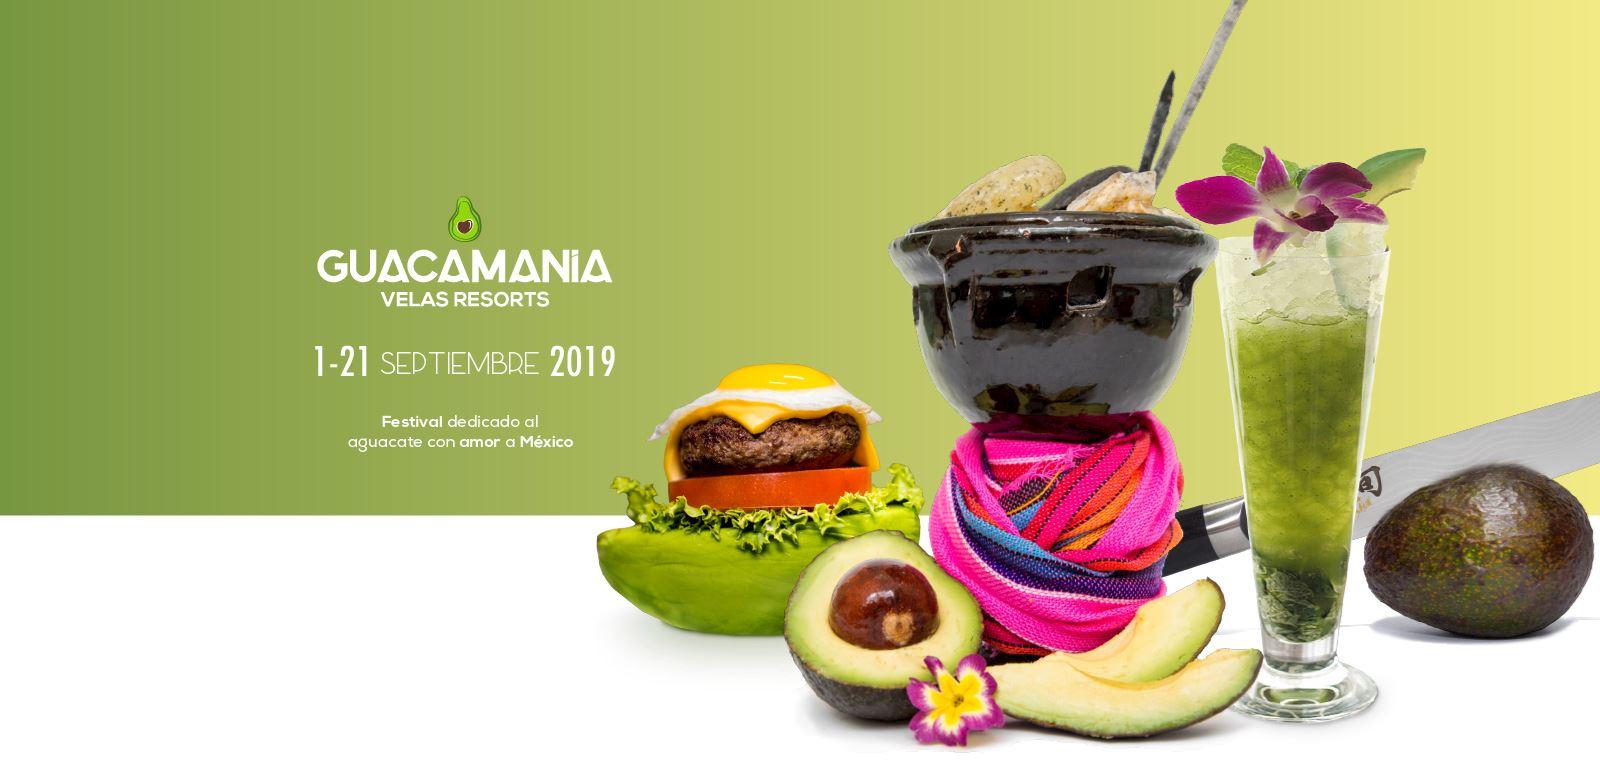 guacamania 2019